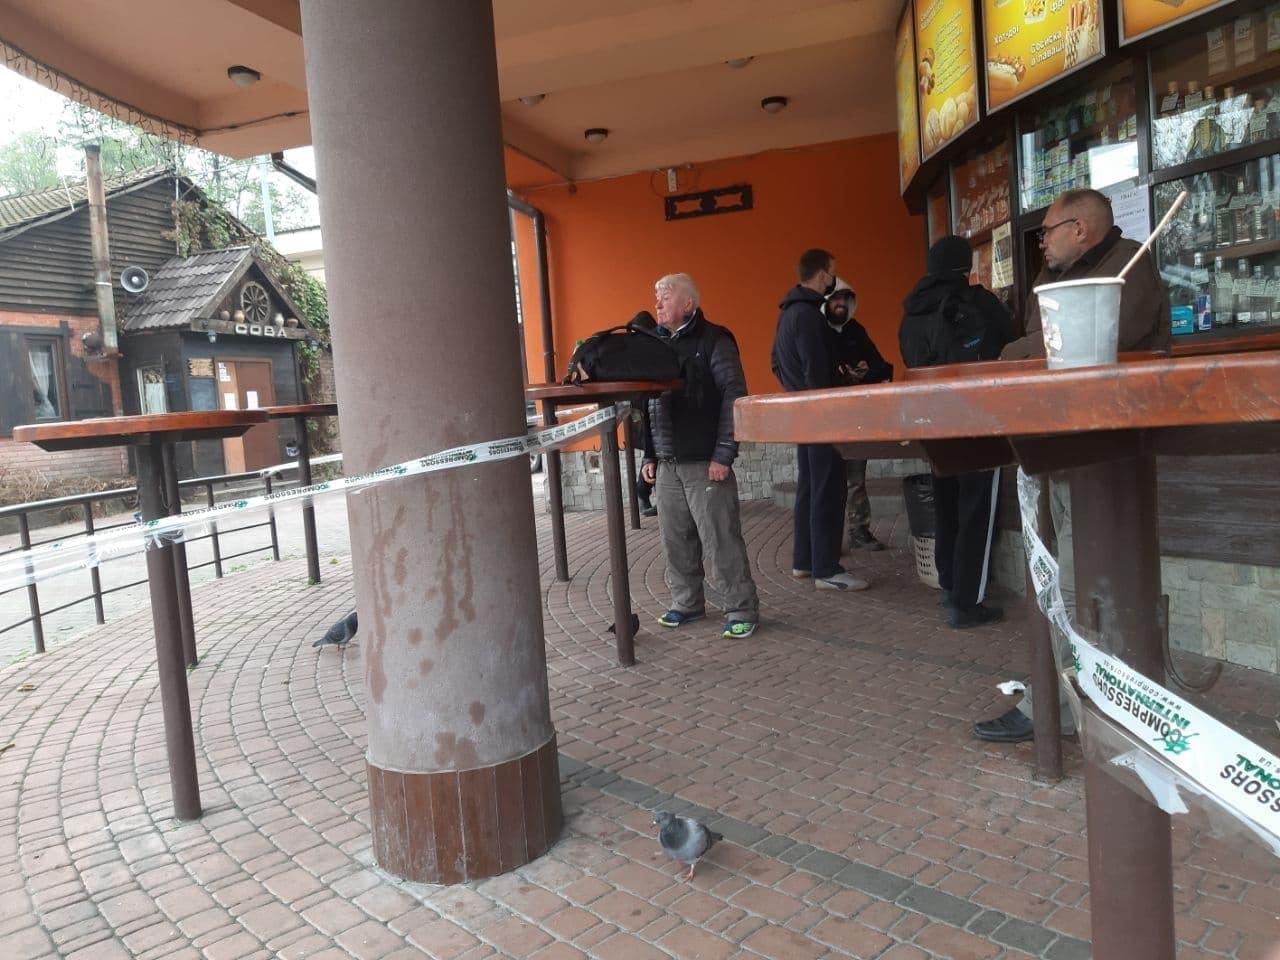 Кафе в Гидропарке попало в громкий скандал из-за карантина выходного дня